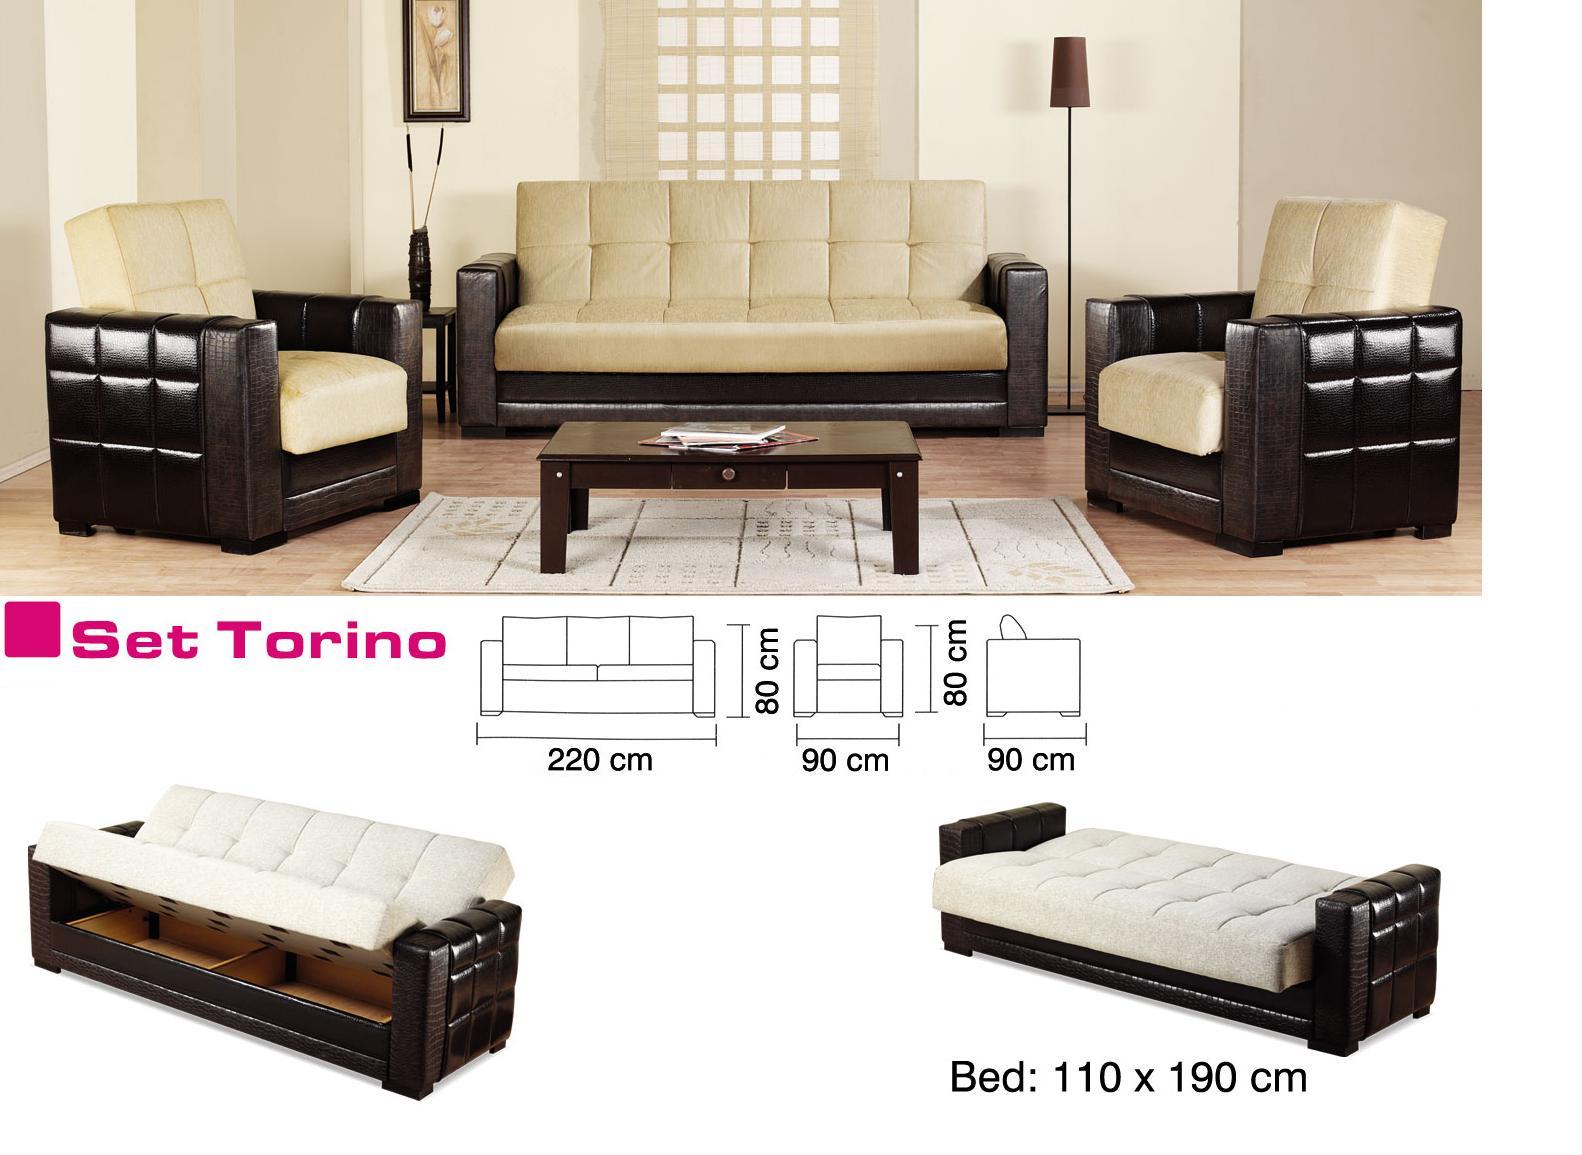 modern line furniture sofa sleepers leather repair north london starline funiture mobilya mebel sofas sofabeds mattresses